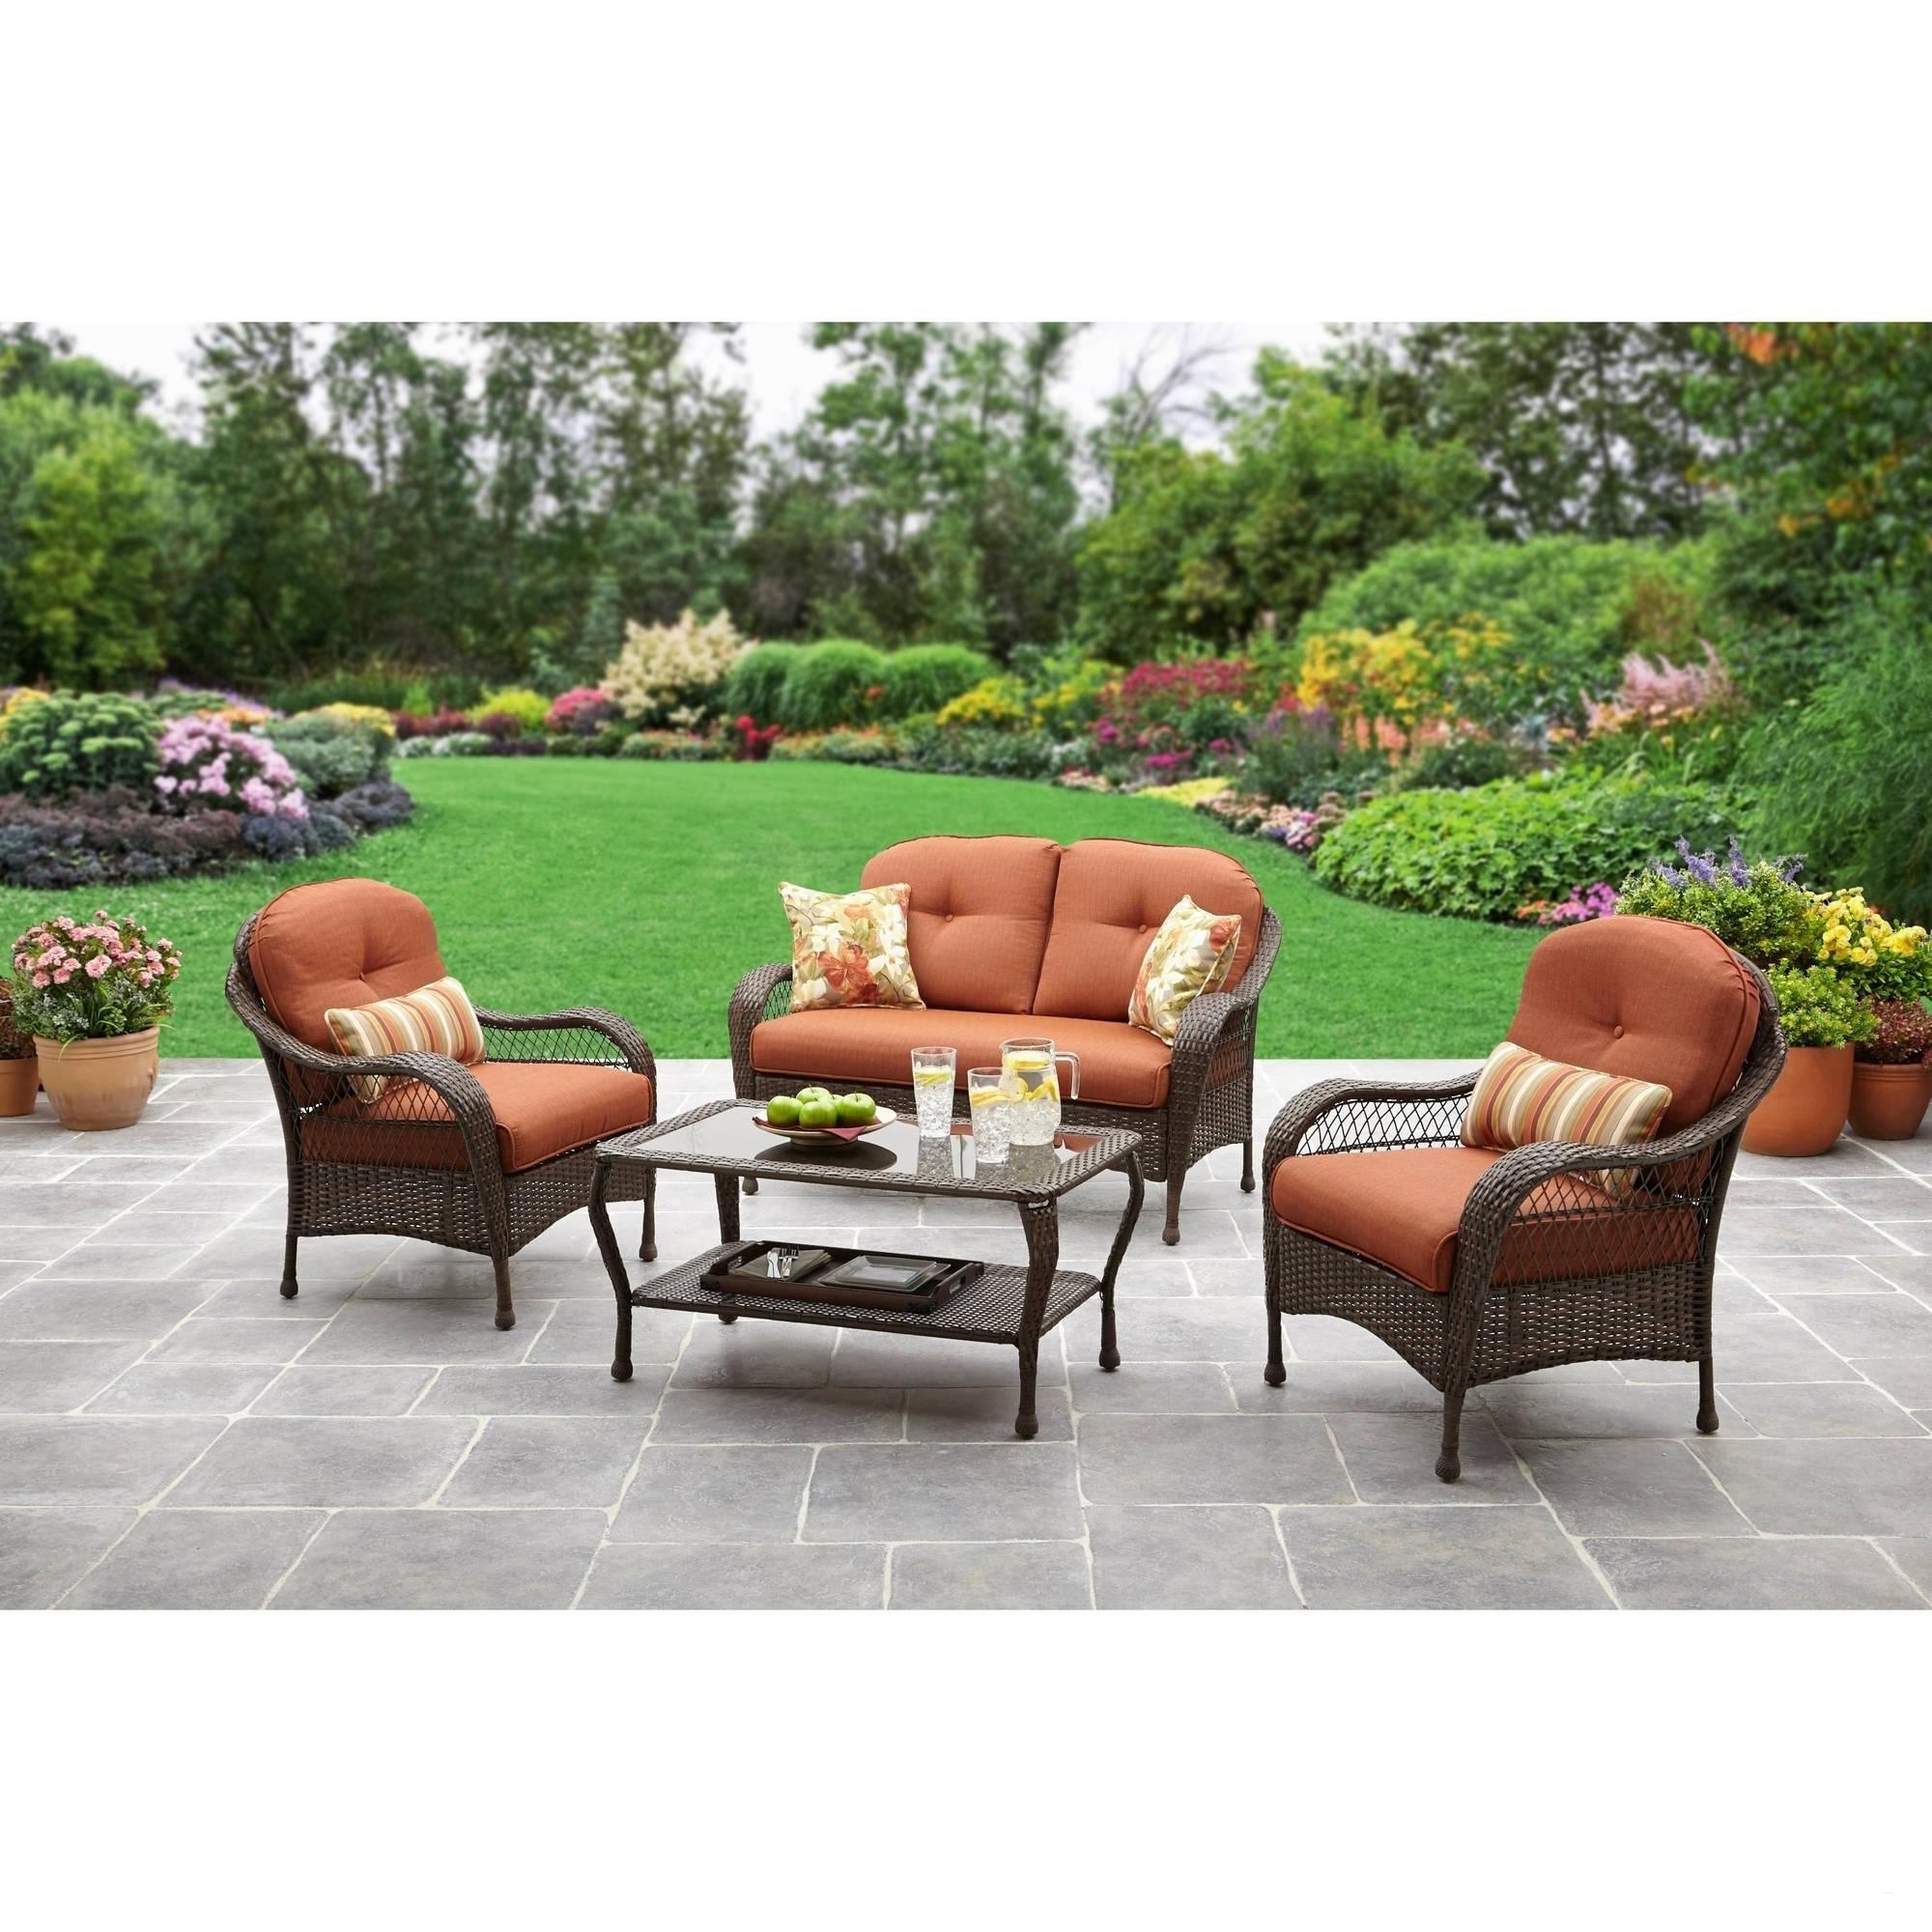 Fashionable Home Depot Patio Furniture Amazon Outdoor Furniture Patio Furniture Intended For Amazon Patio Furniture Conversation Sets (View 2 of 15)